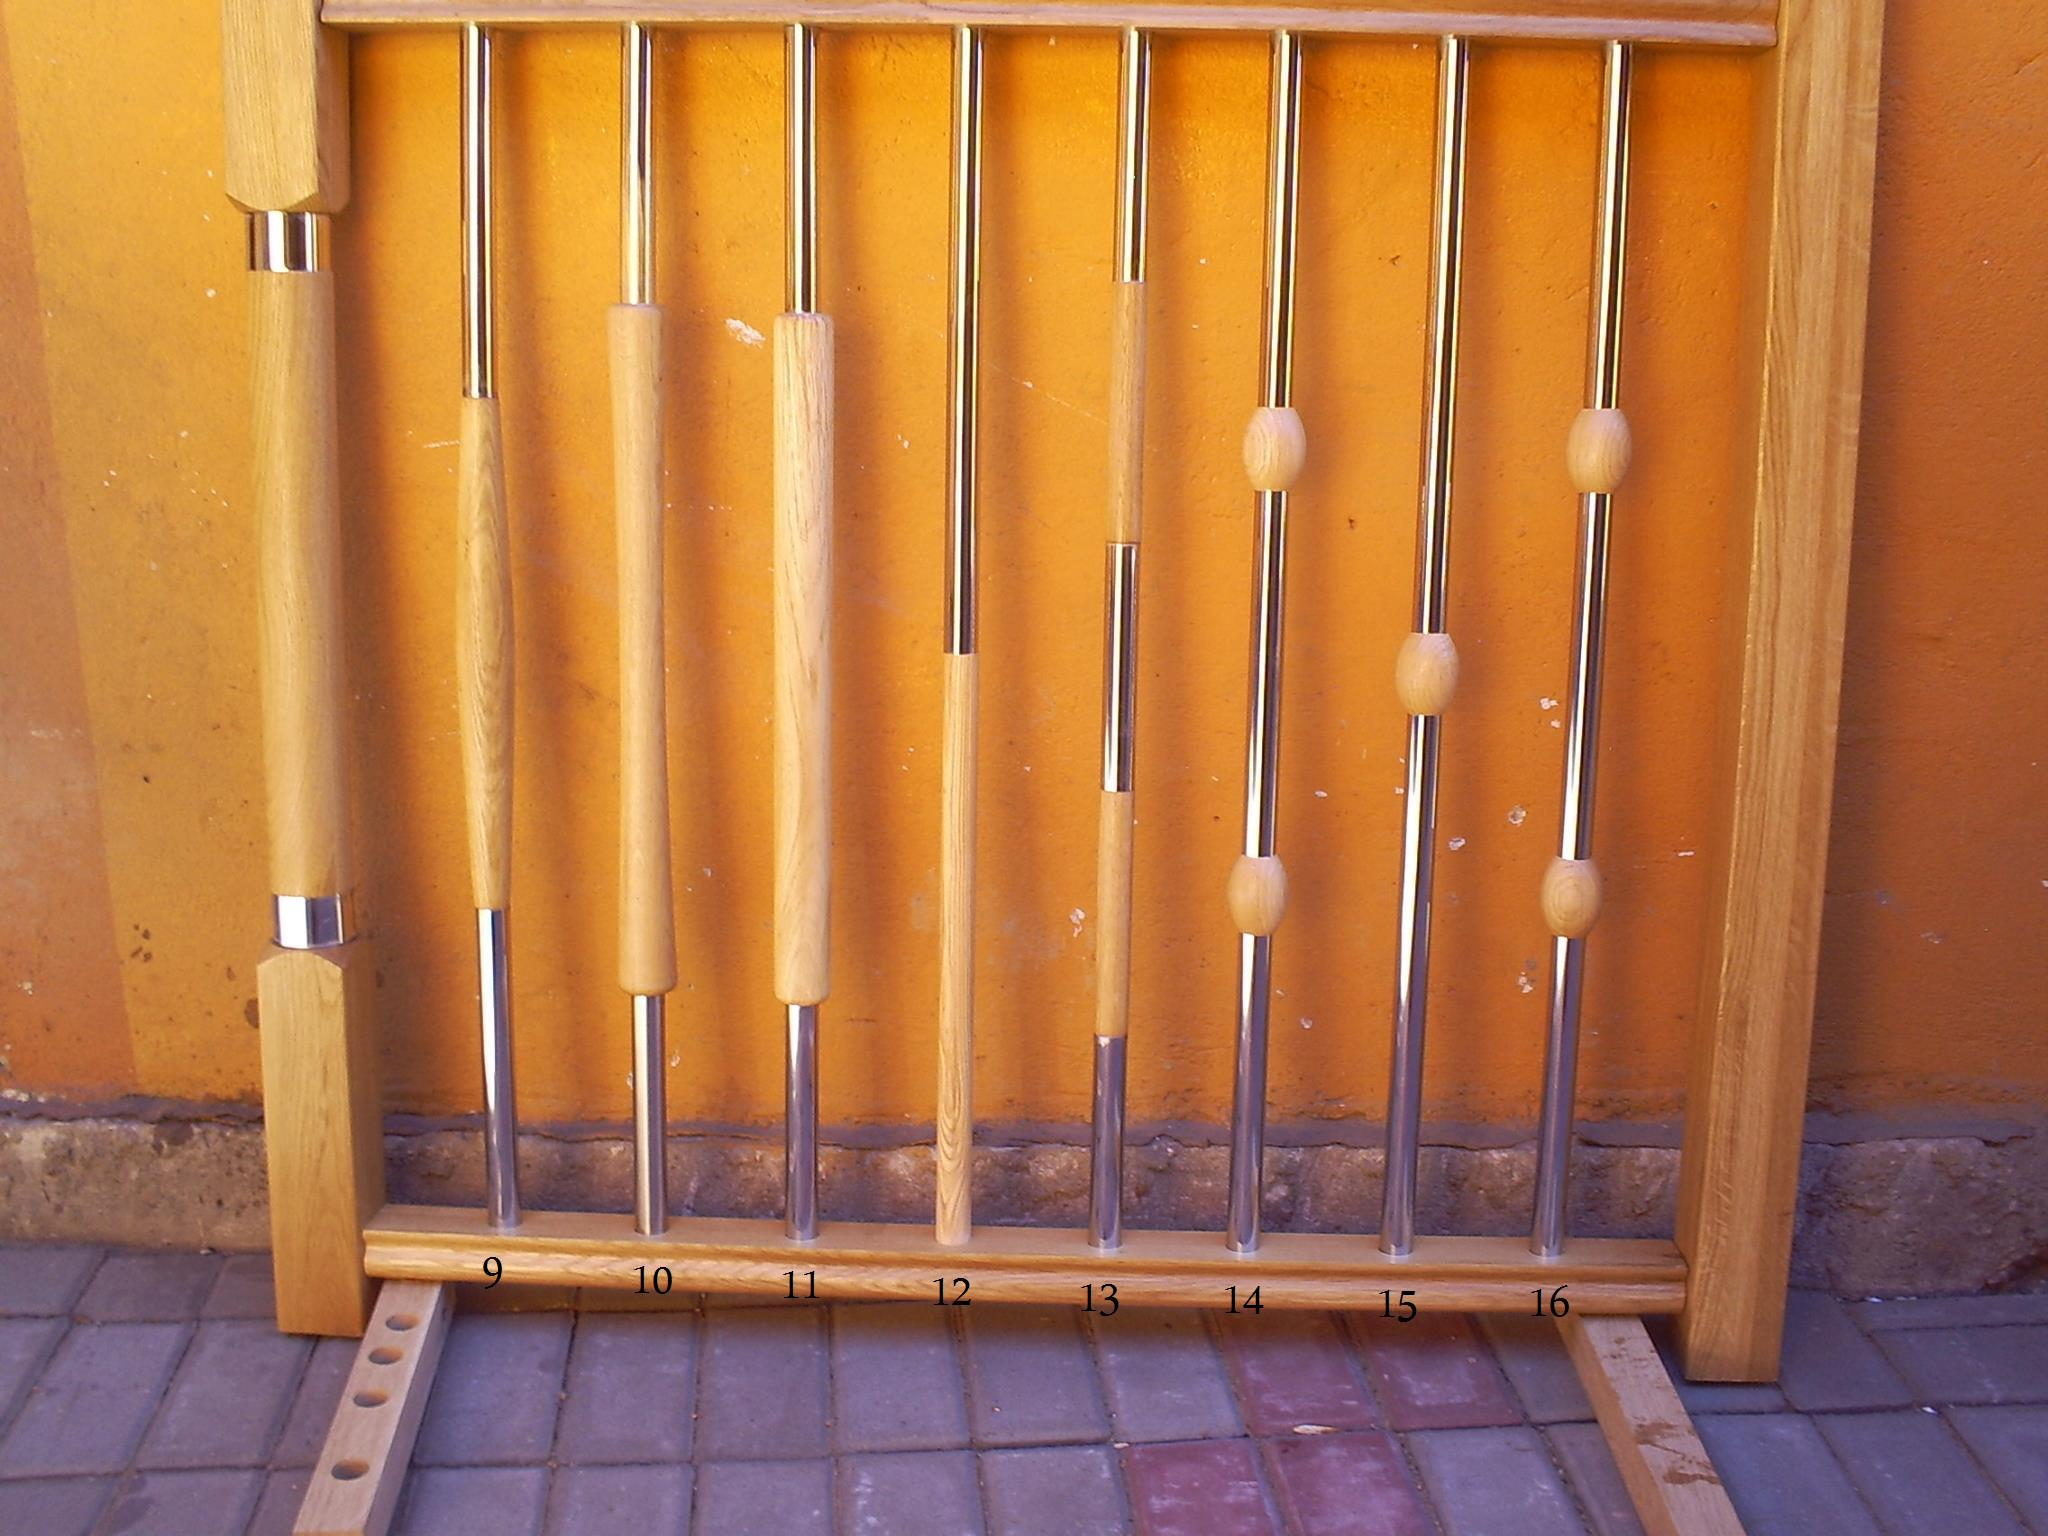 tralki schodowe balustrady meble drewniane bia�e meble